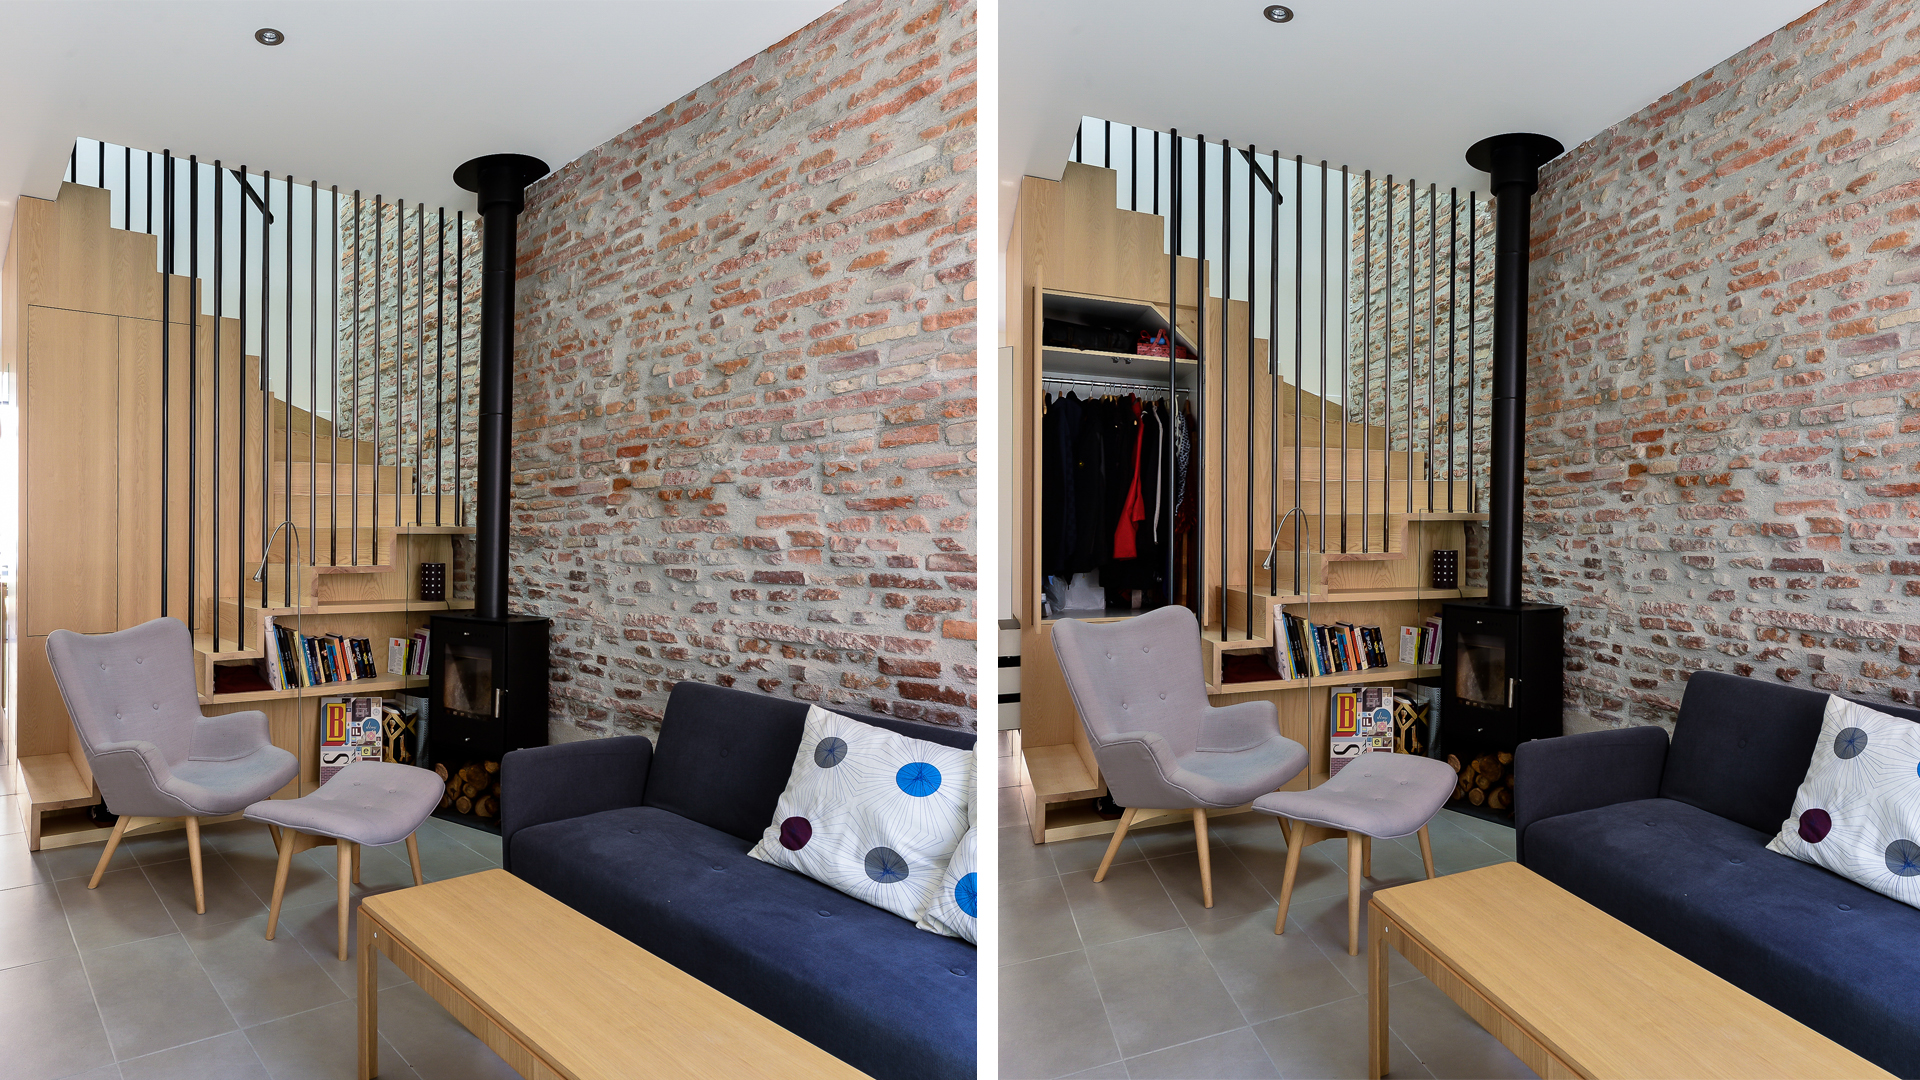 10-seuil-architecture-maison-g-et-b-credit-ph-stephane-brugidou